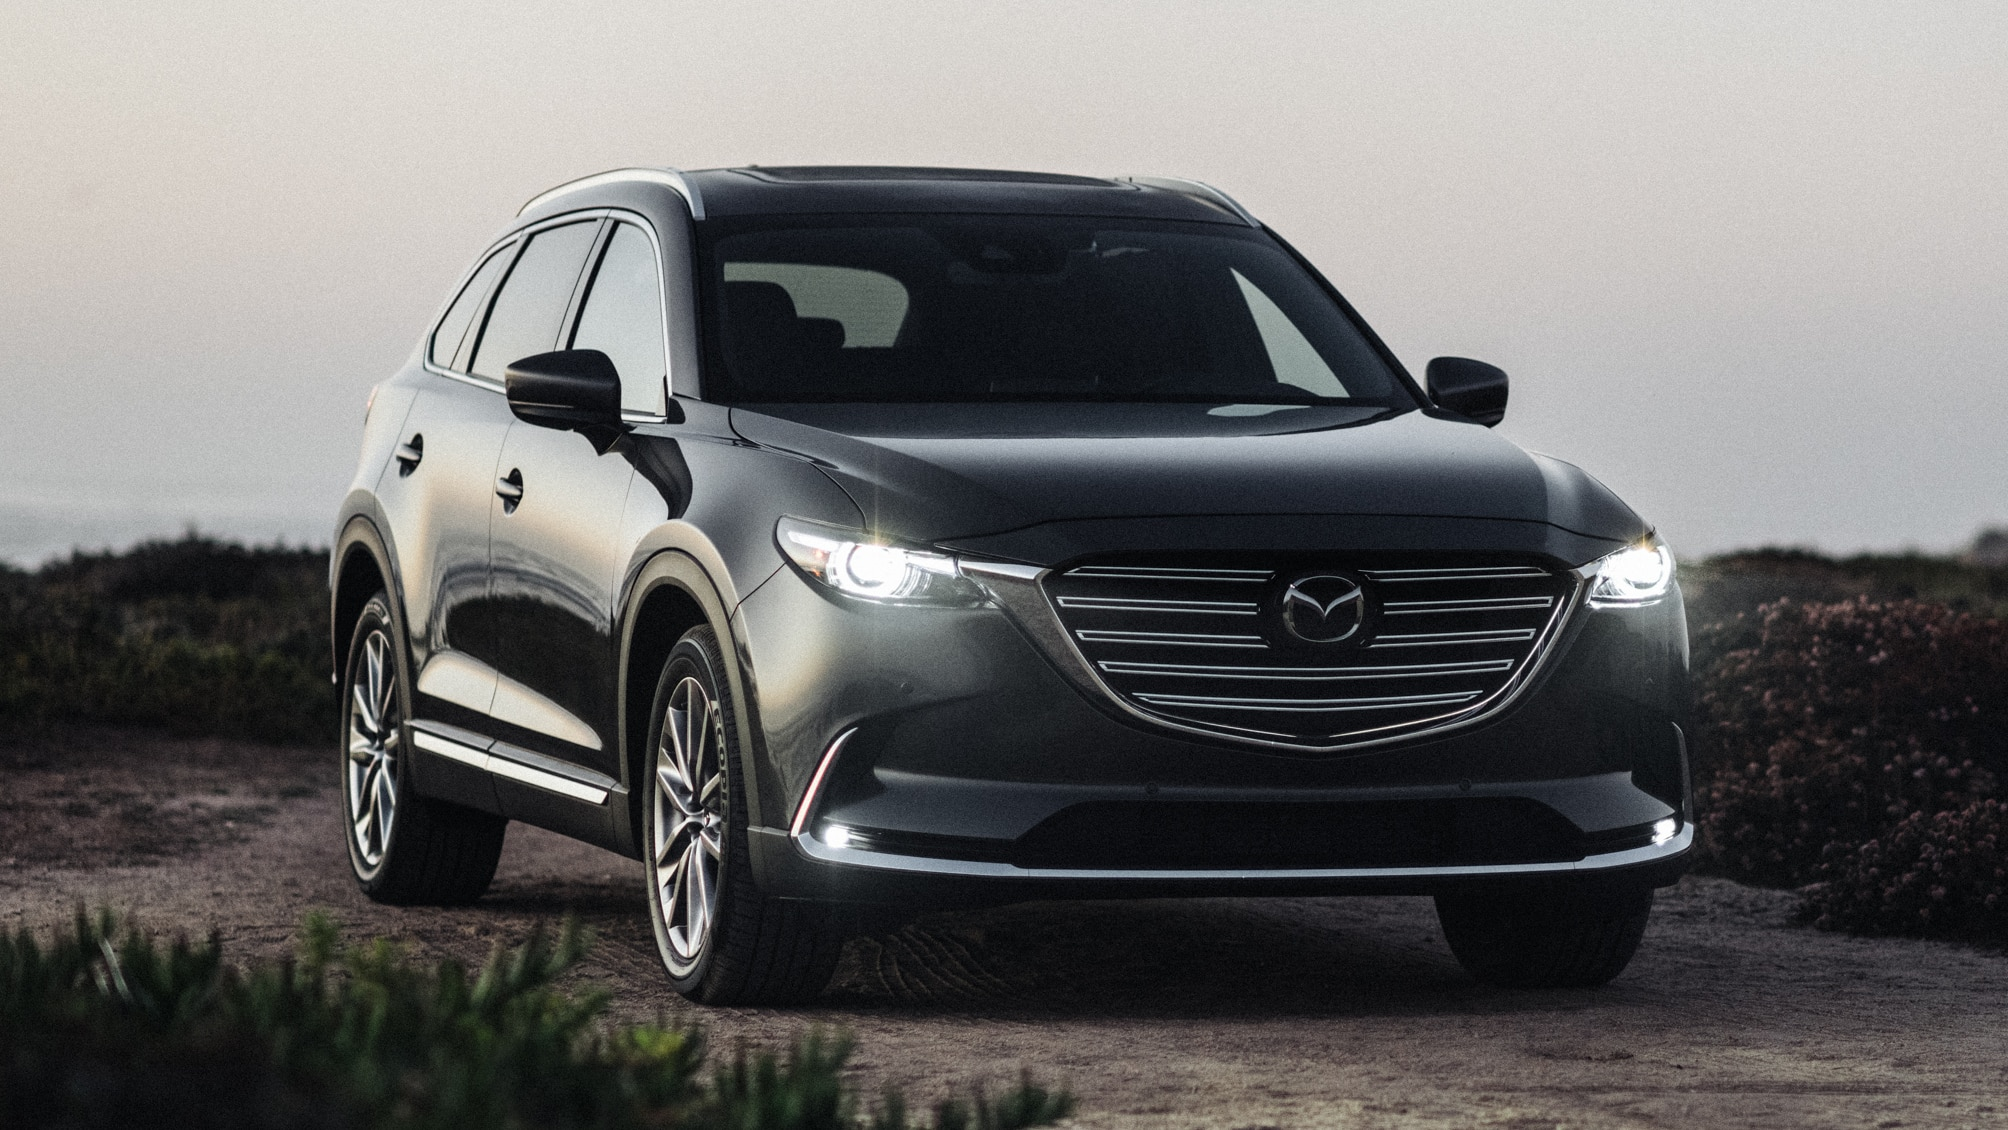 2020 Mazda Cx 9 Rumors New Concept